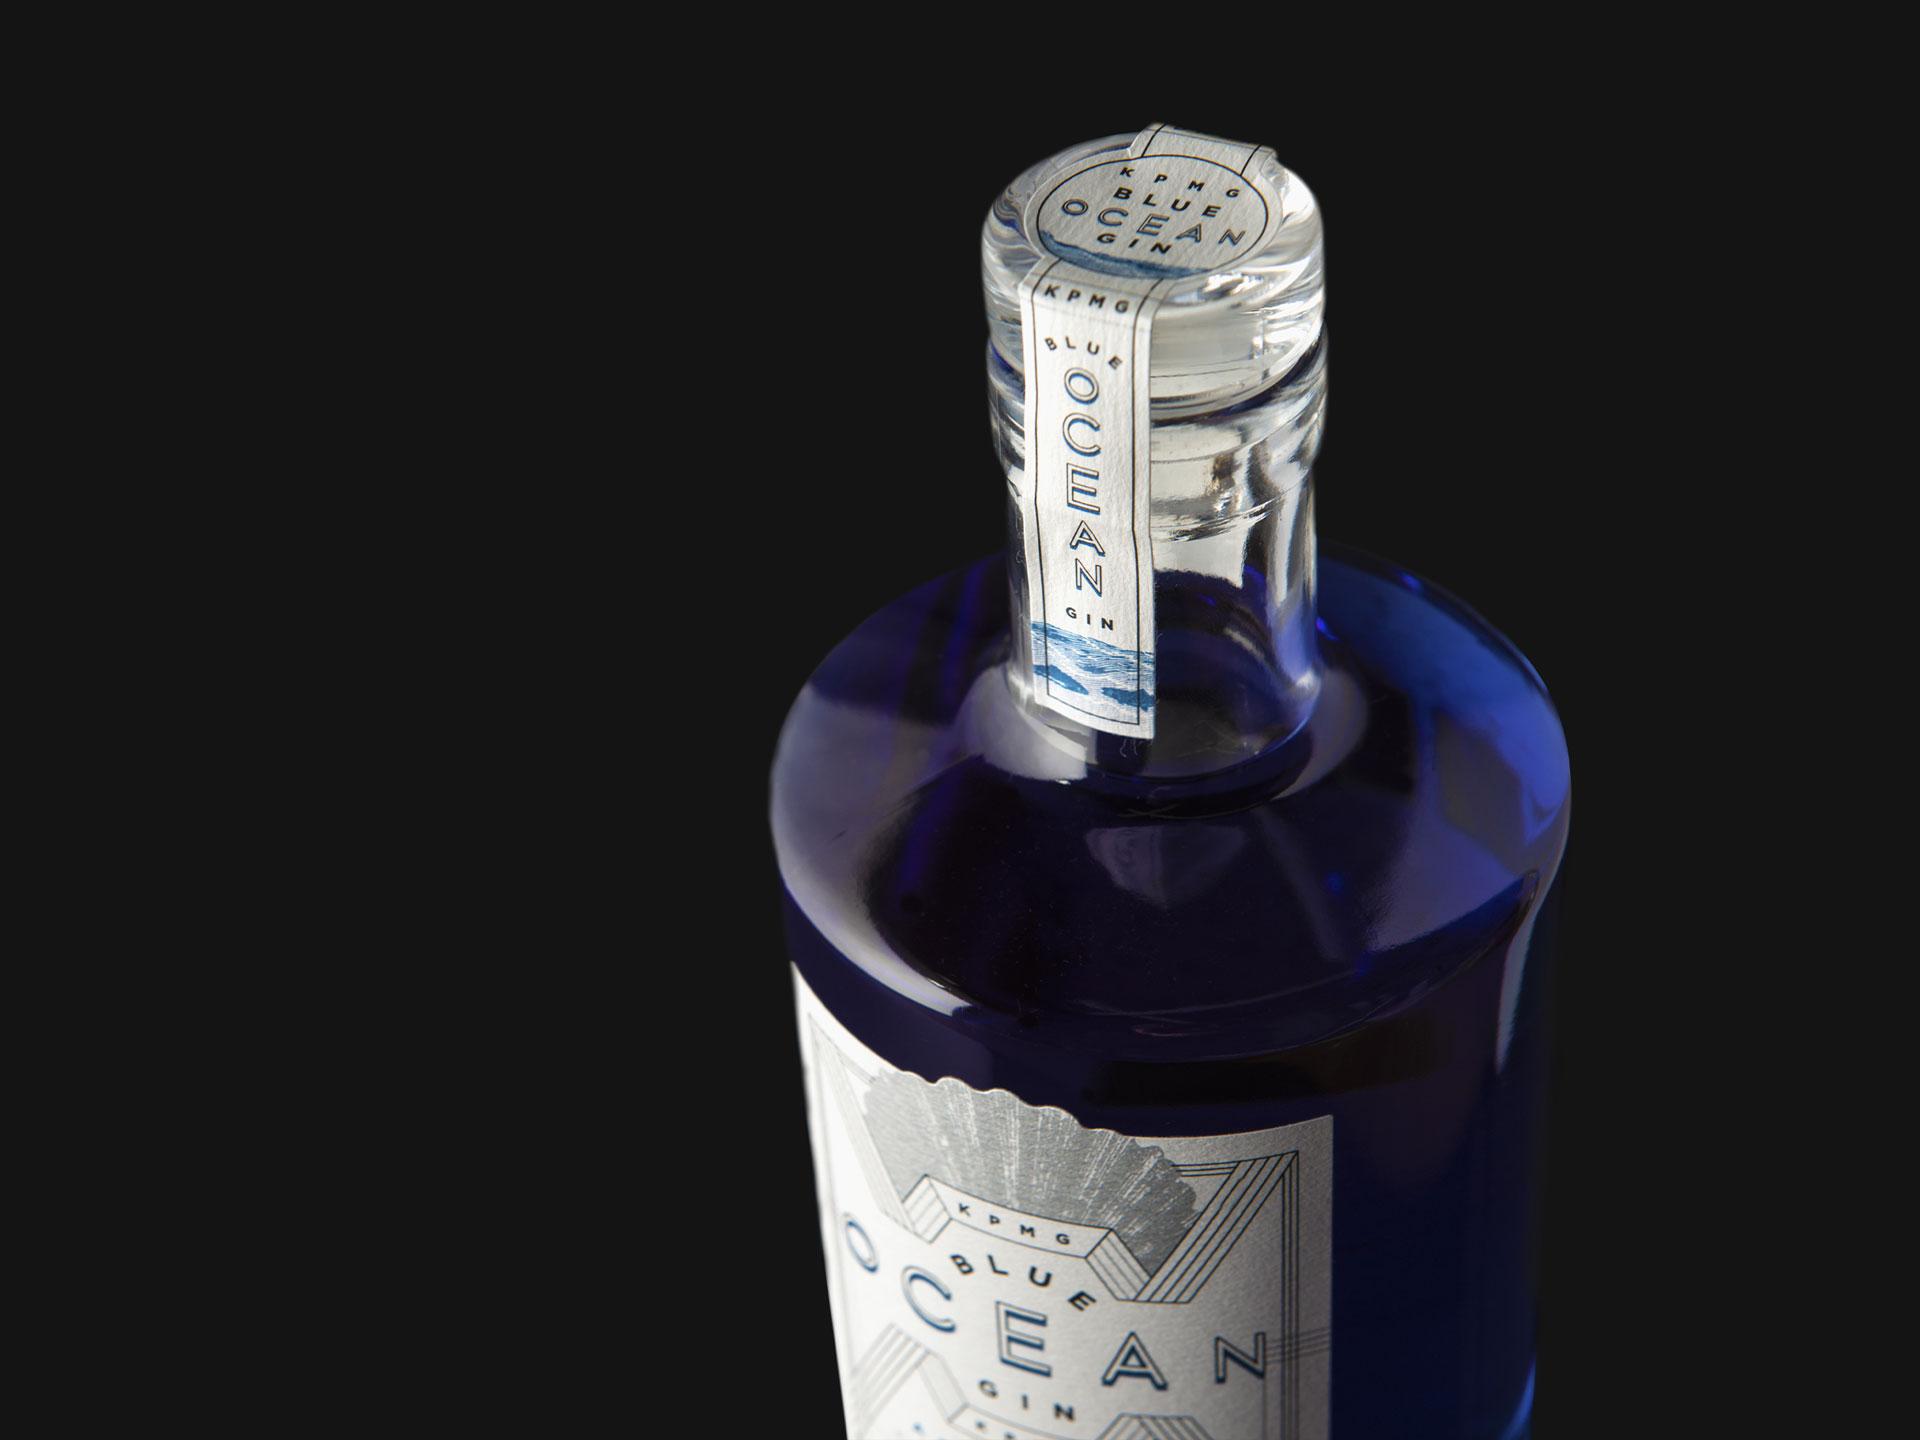 photograph of KPMG gin bottle